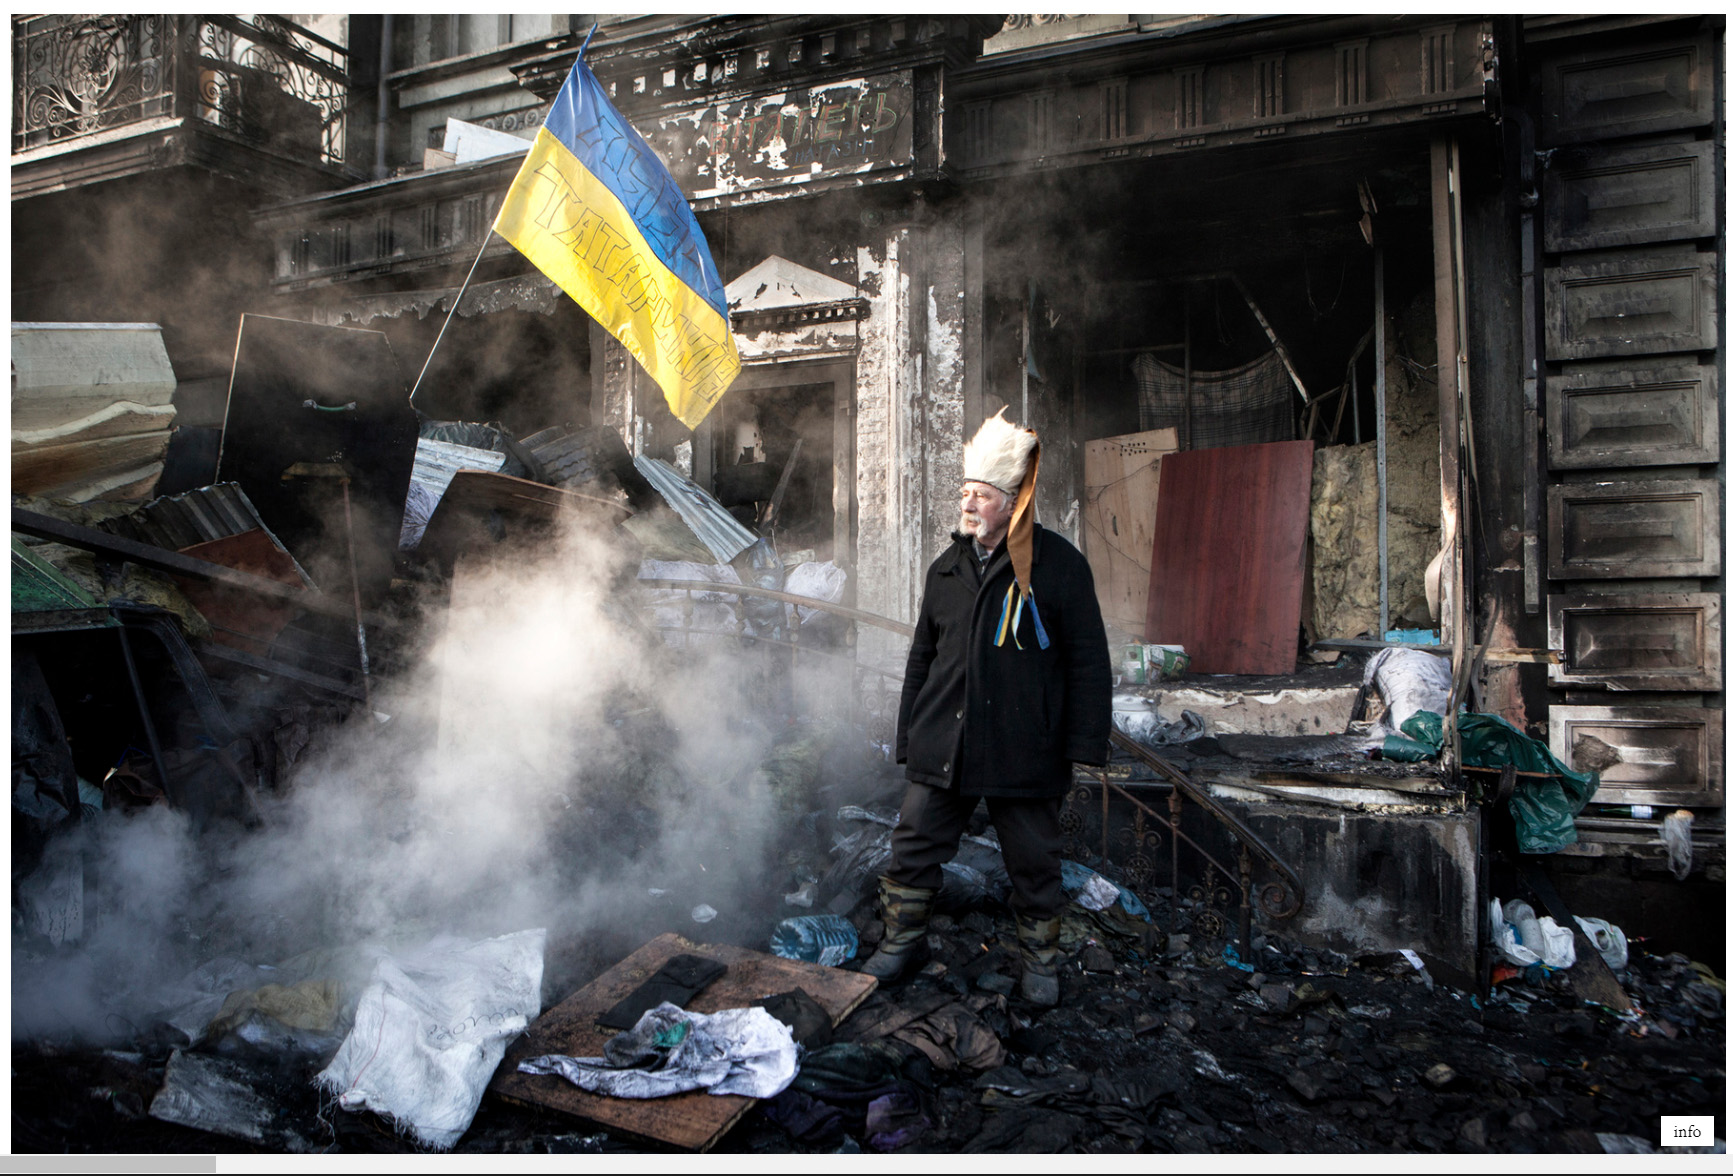 Hirling Bálint: A Majdan falu lakói / Dwellers of the Independence Square, 2014 © Hirling Bálint